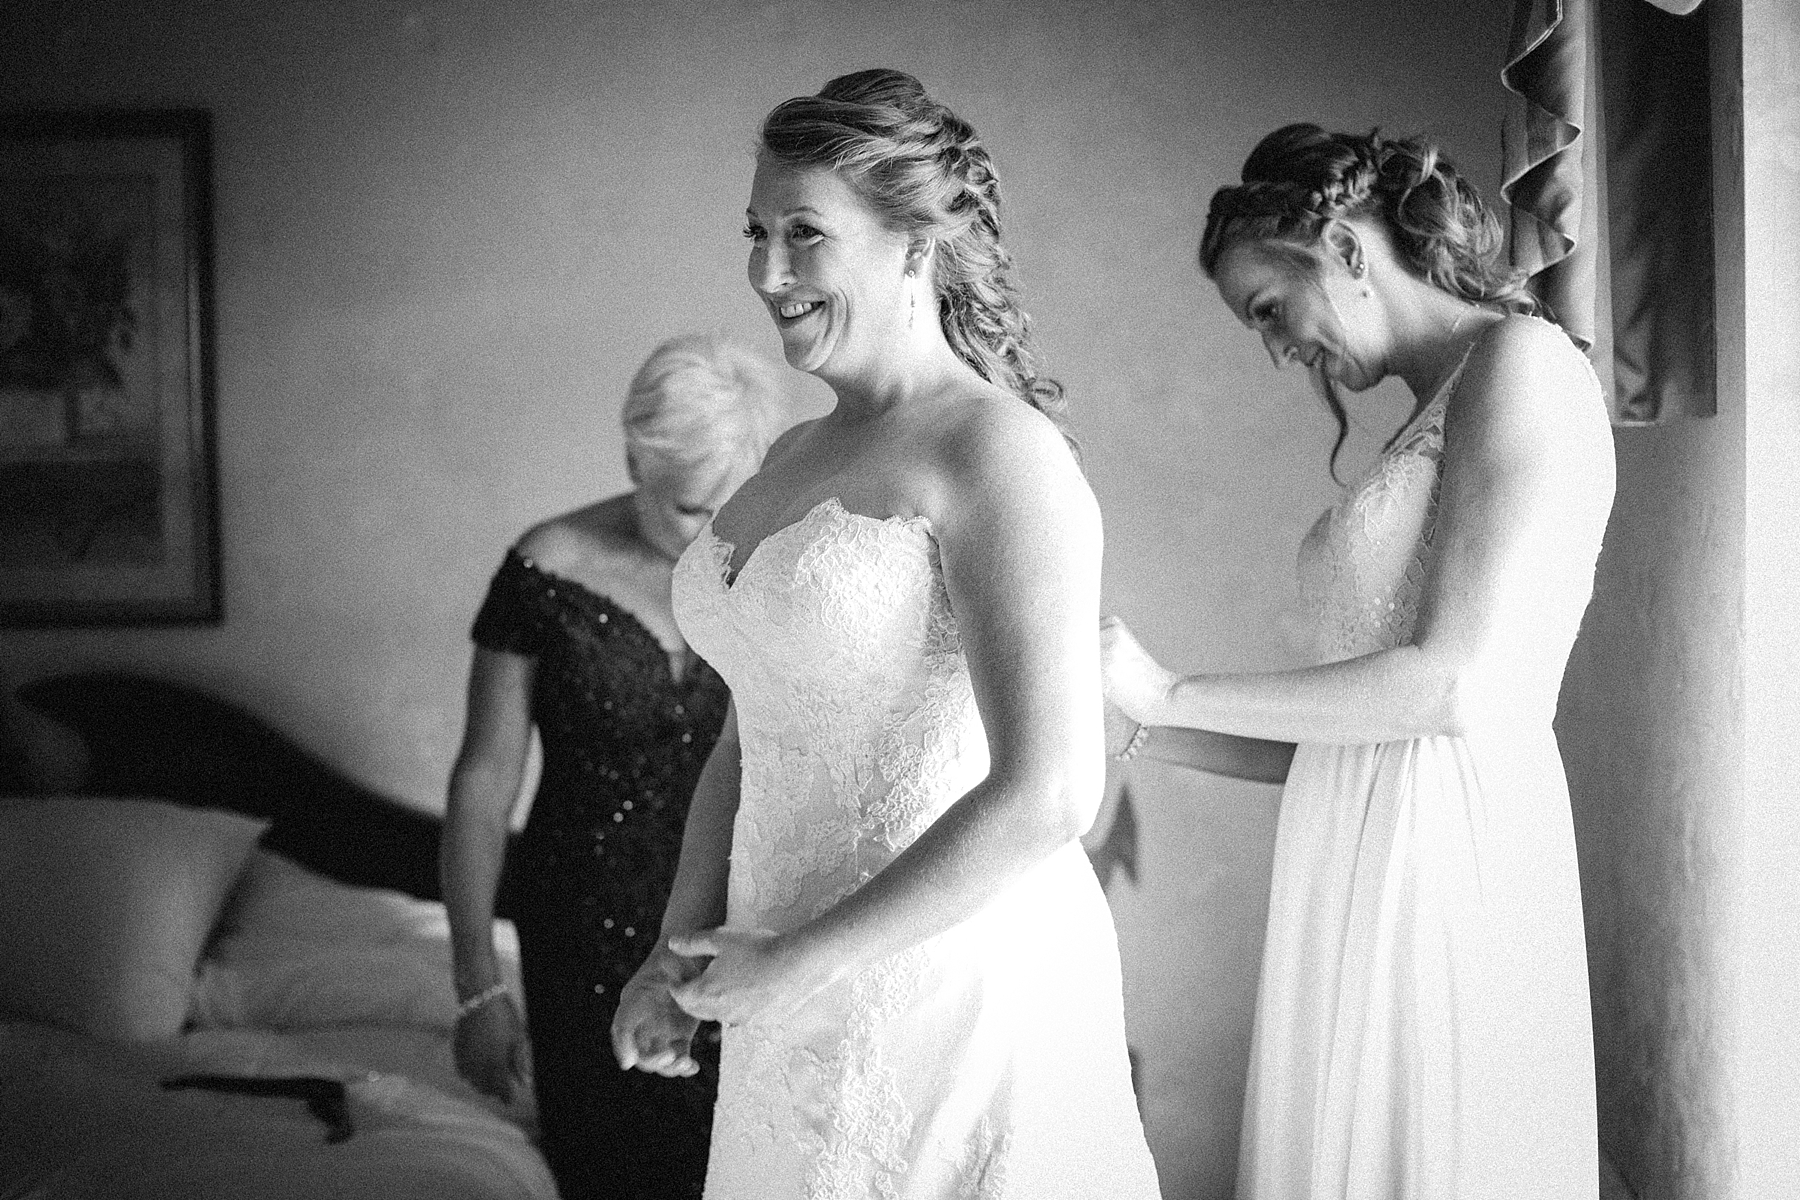 farm-wedding-engagement-session-destination-intimate_0020.jpg